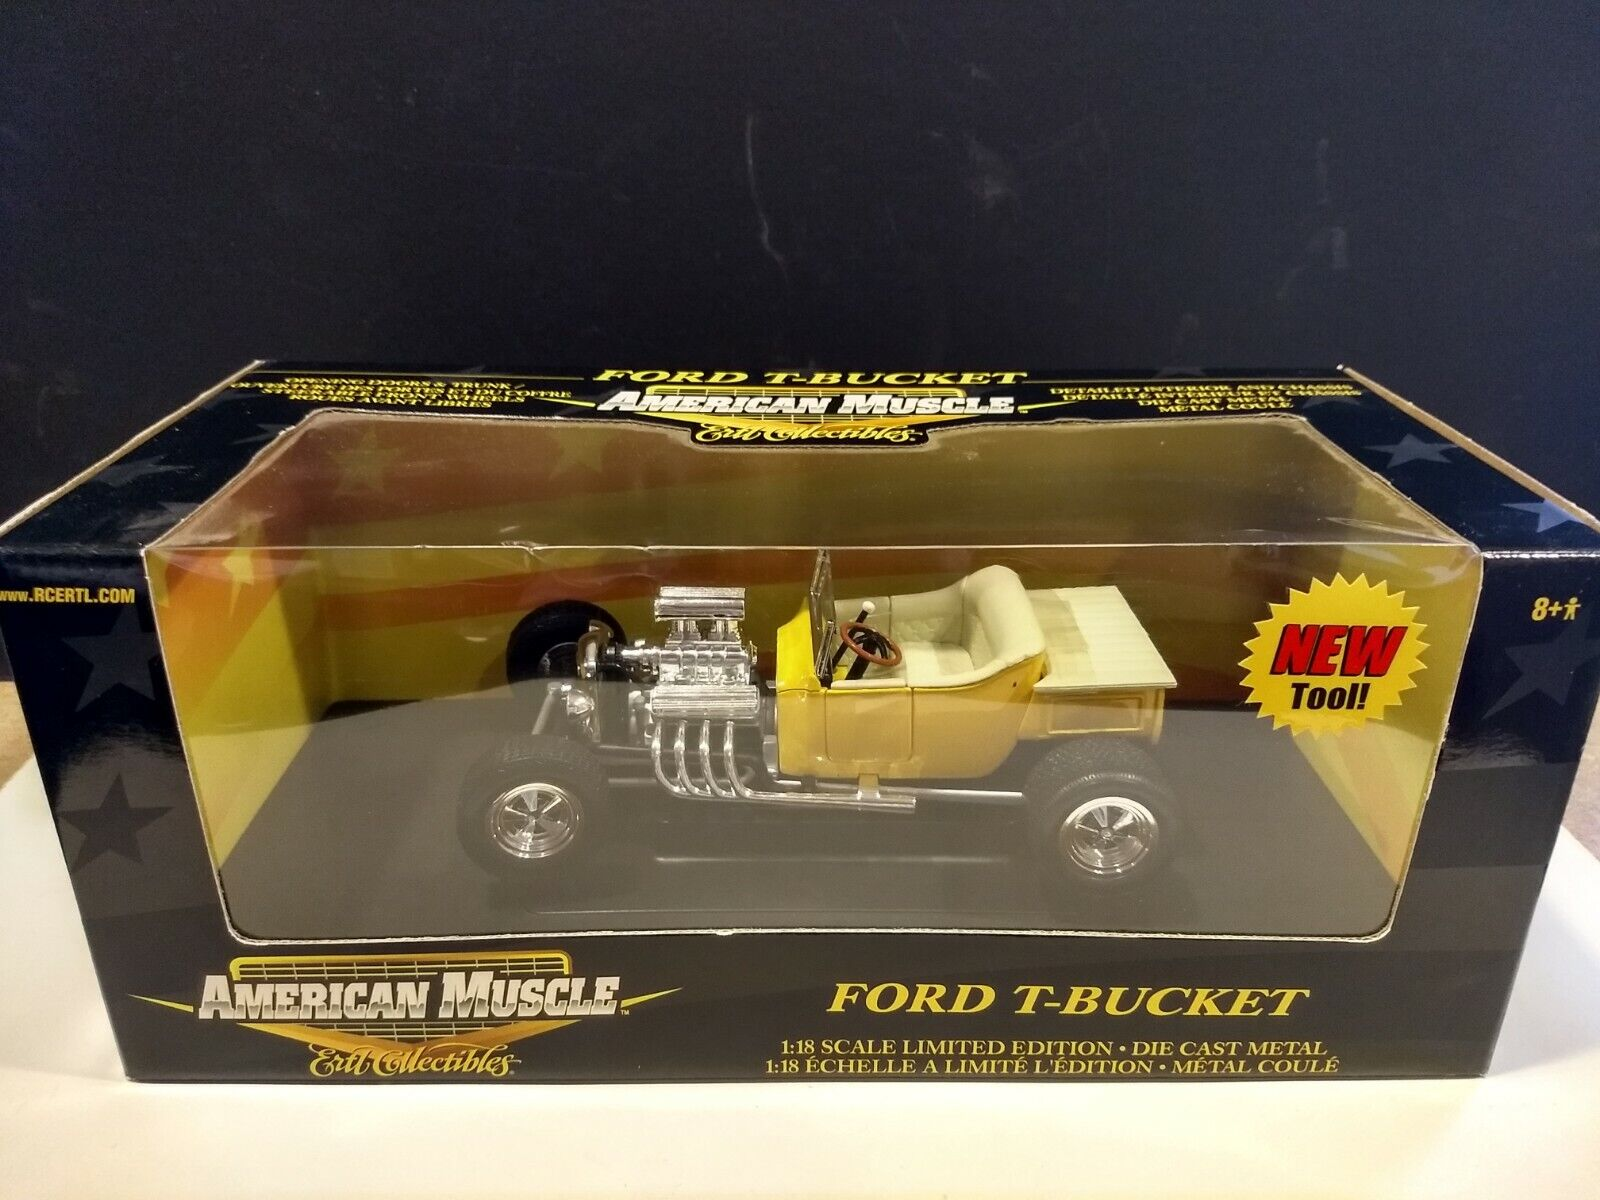 1923 Ford T-Bucket en Amarillo \ Marfil por ERTL American Muscle 1 18 Scale Die Cast